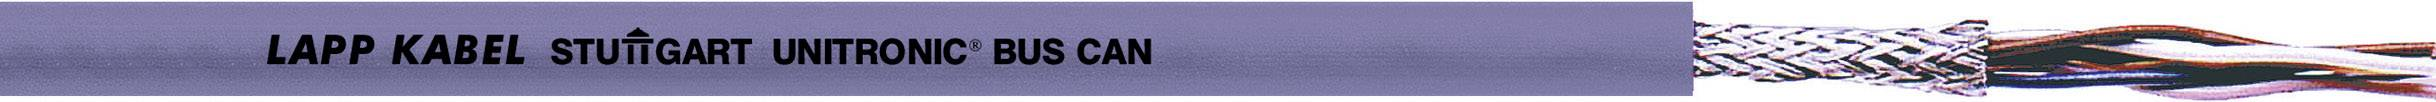 Sběrnicový kabel LappKabel BUS CAN (2170261), 120 Ω